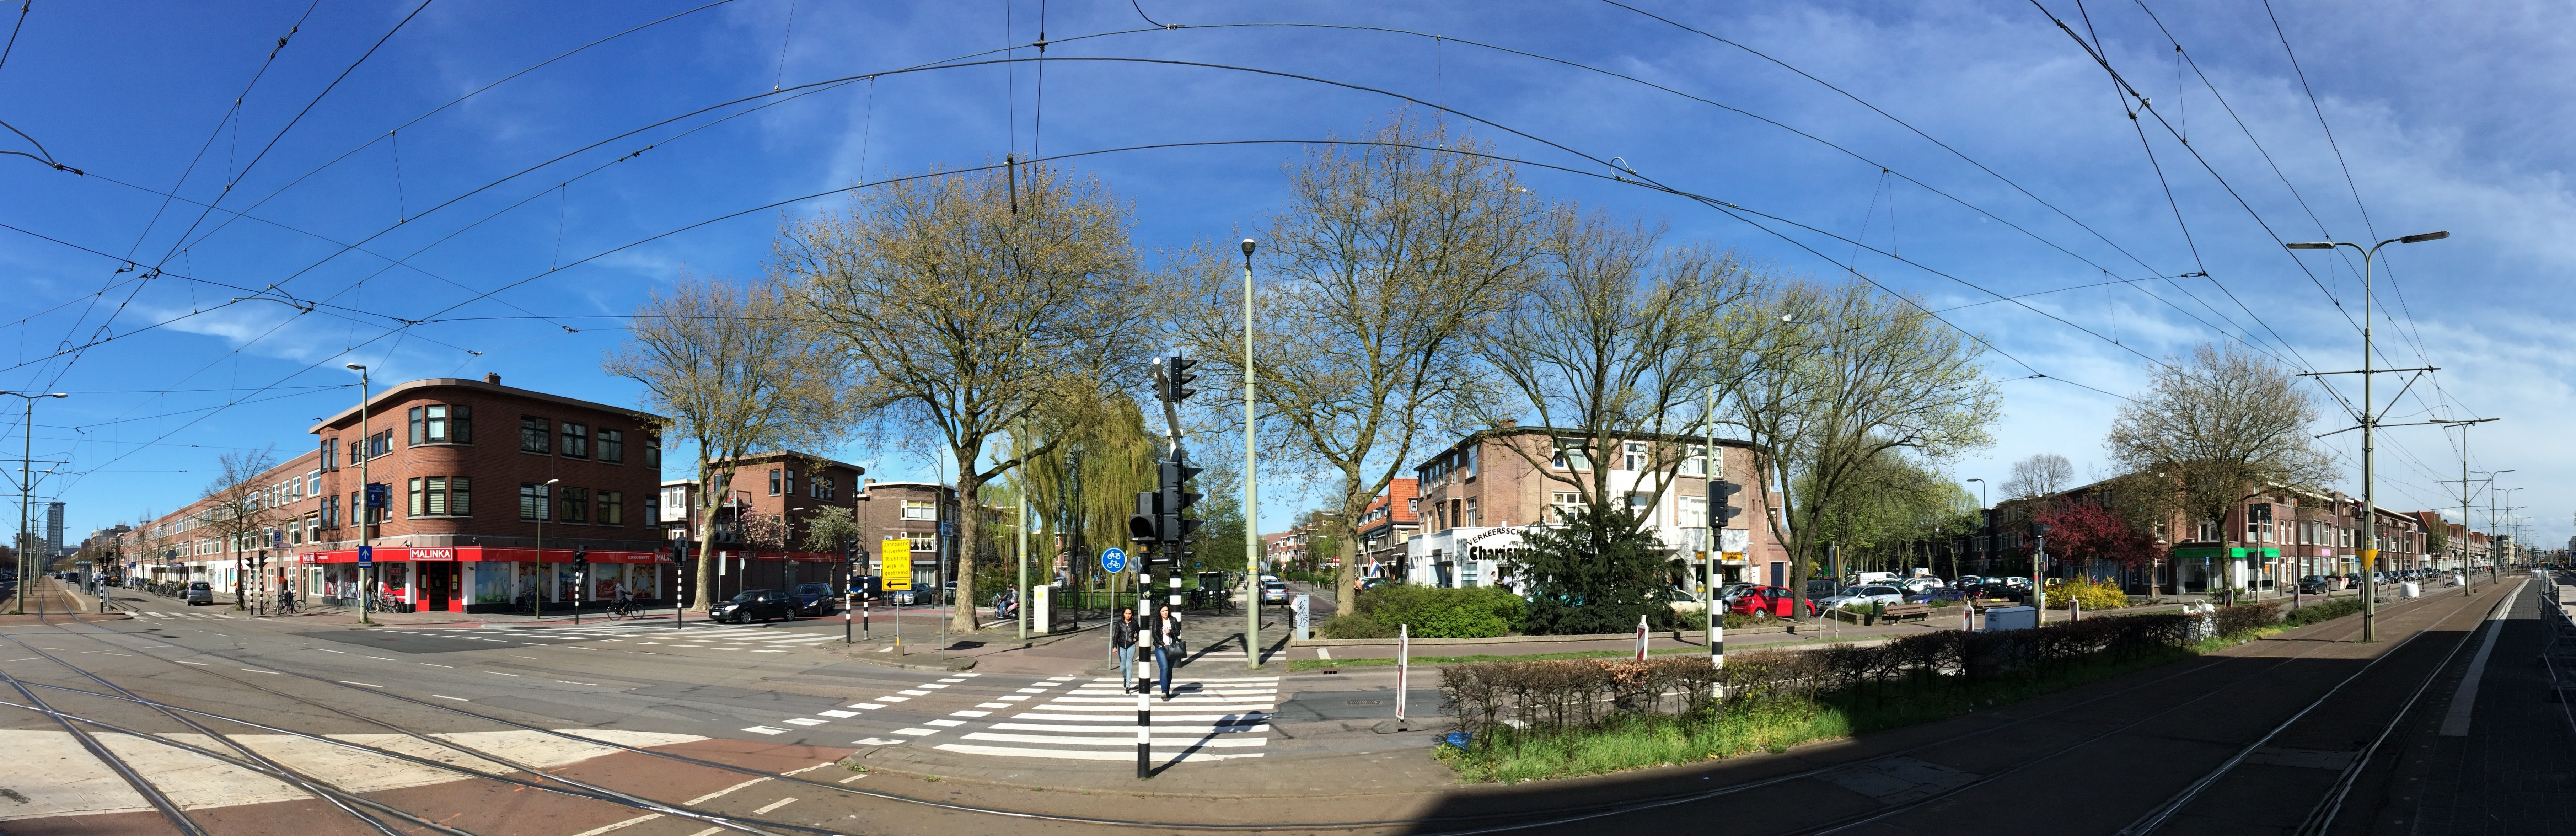 Rijswijk Netherlands  city photos gallery : Netherlands, Rijswijk, Haagweg 1 Wikimedia Commons